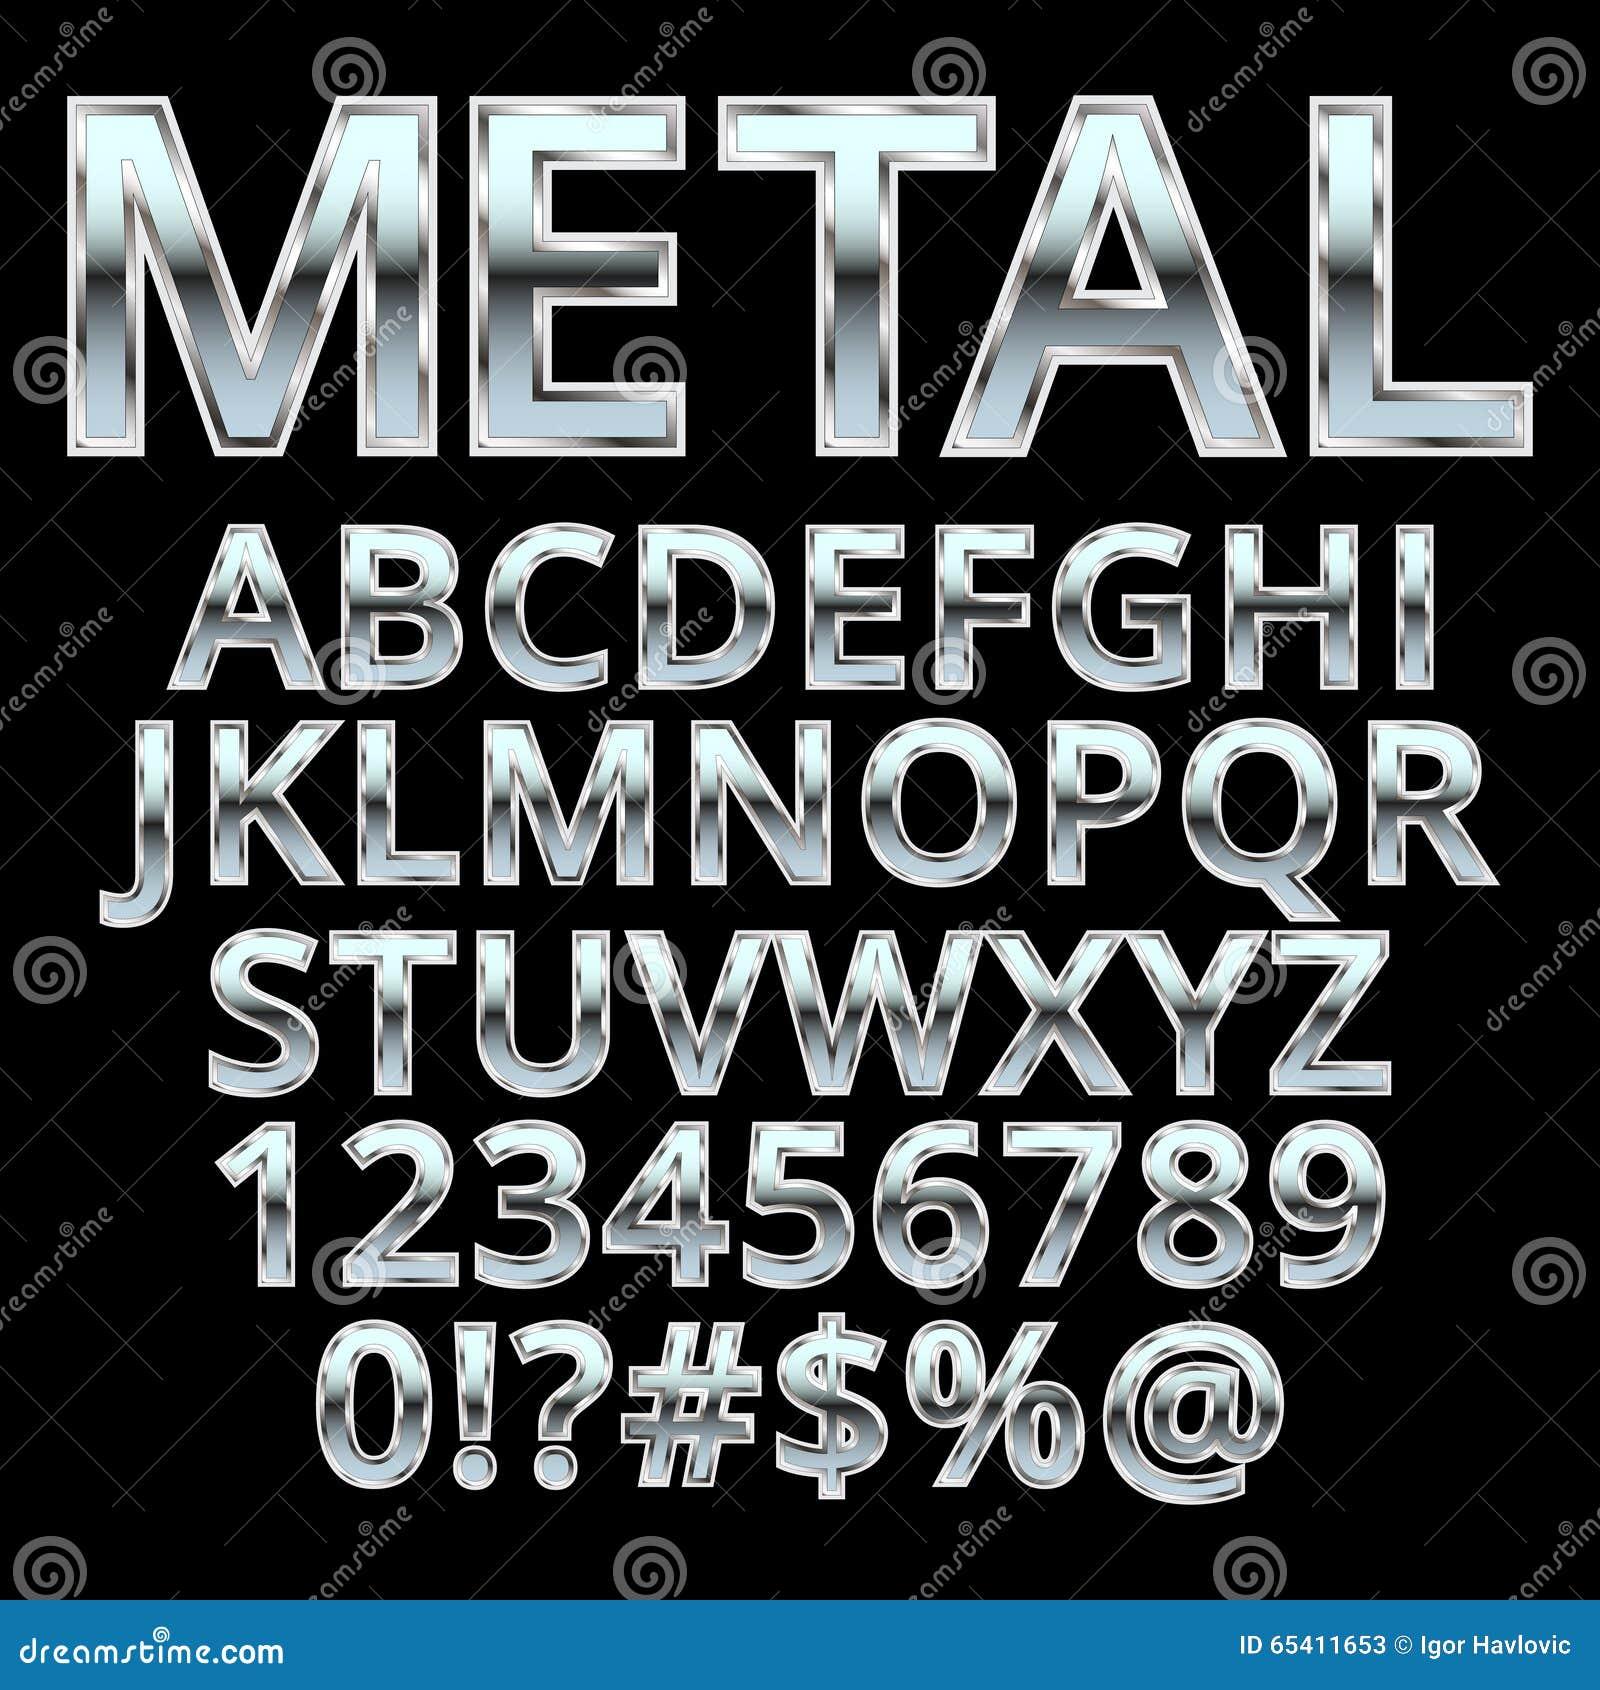 Metallartalphabet